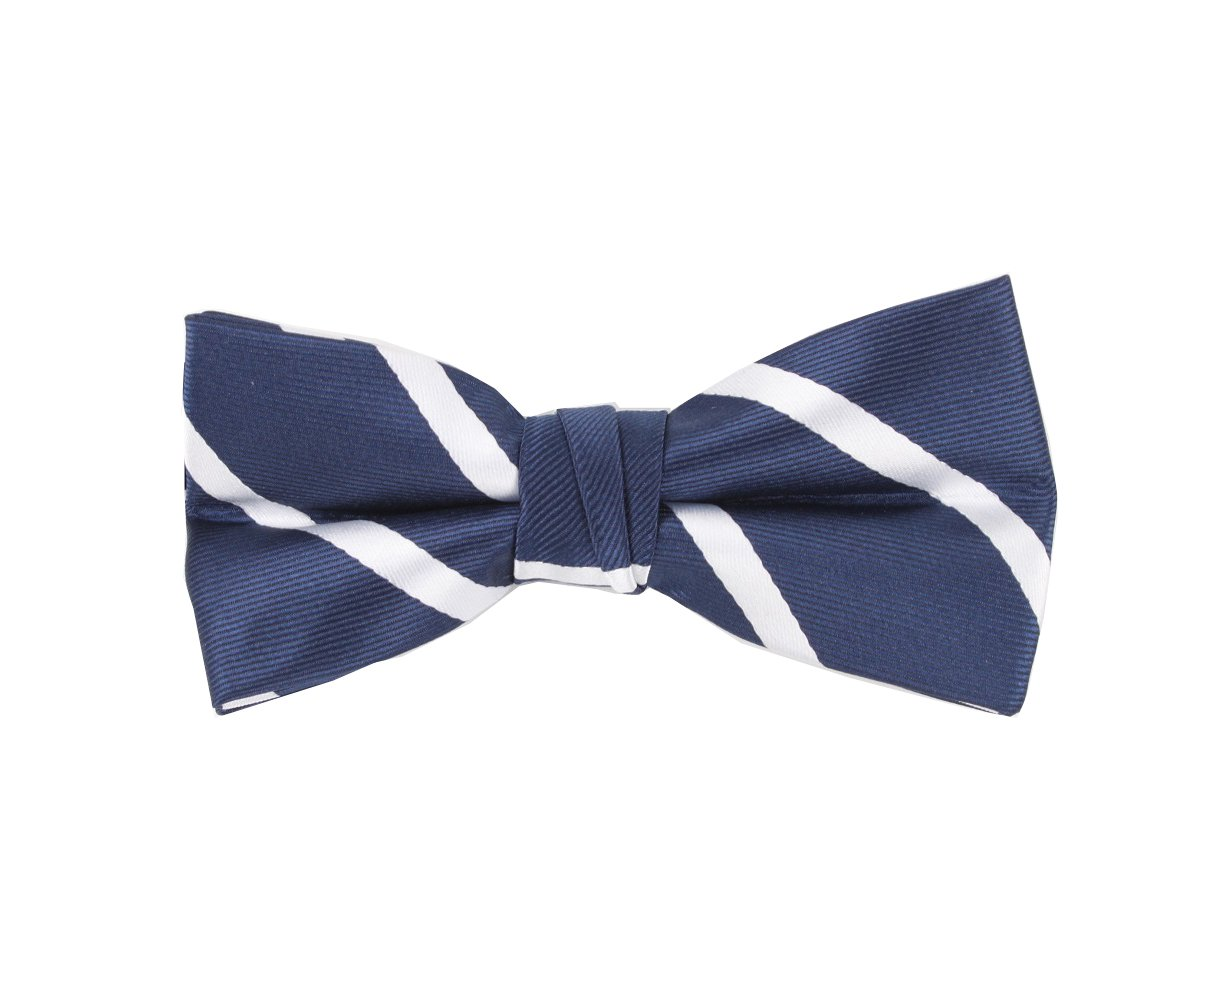 Born to Love - Boys Kids Pre Tied Bowtie Christmas Holiday Party Dress Up Bow Tie (Medium, Navy White Stripes)